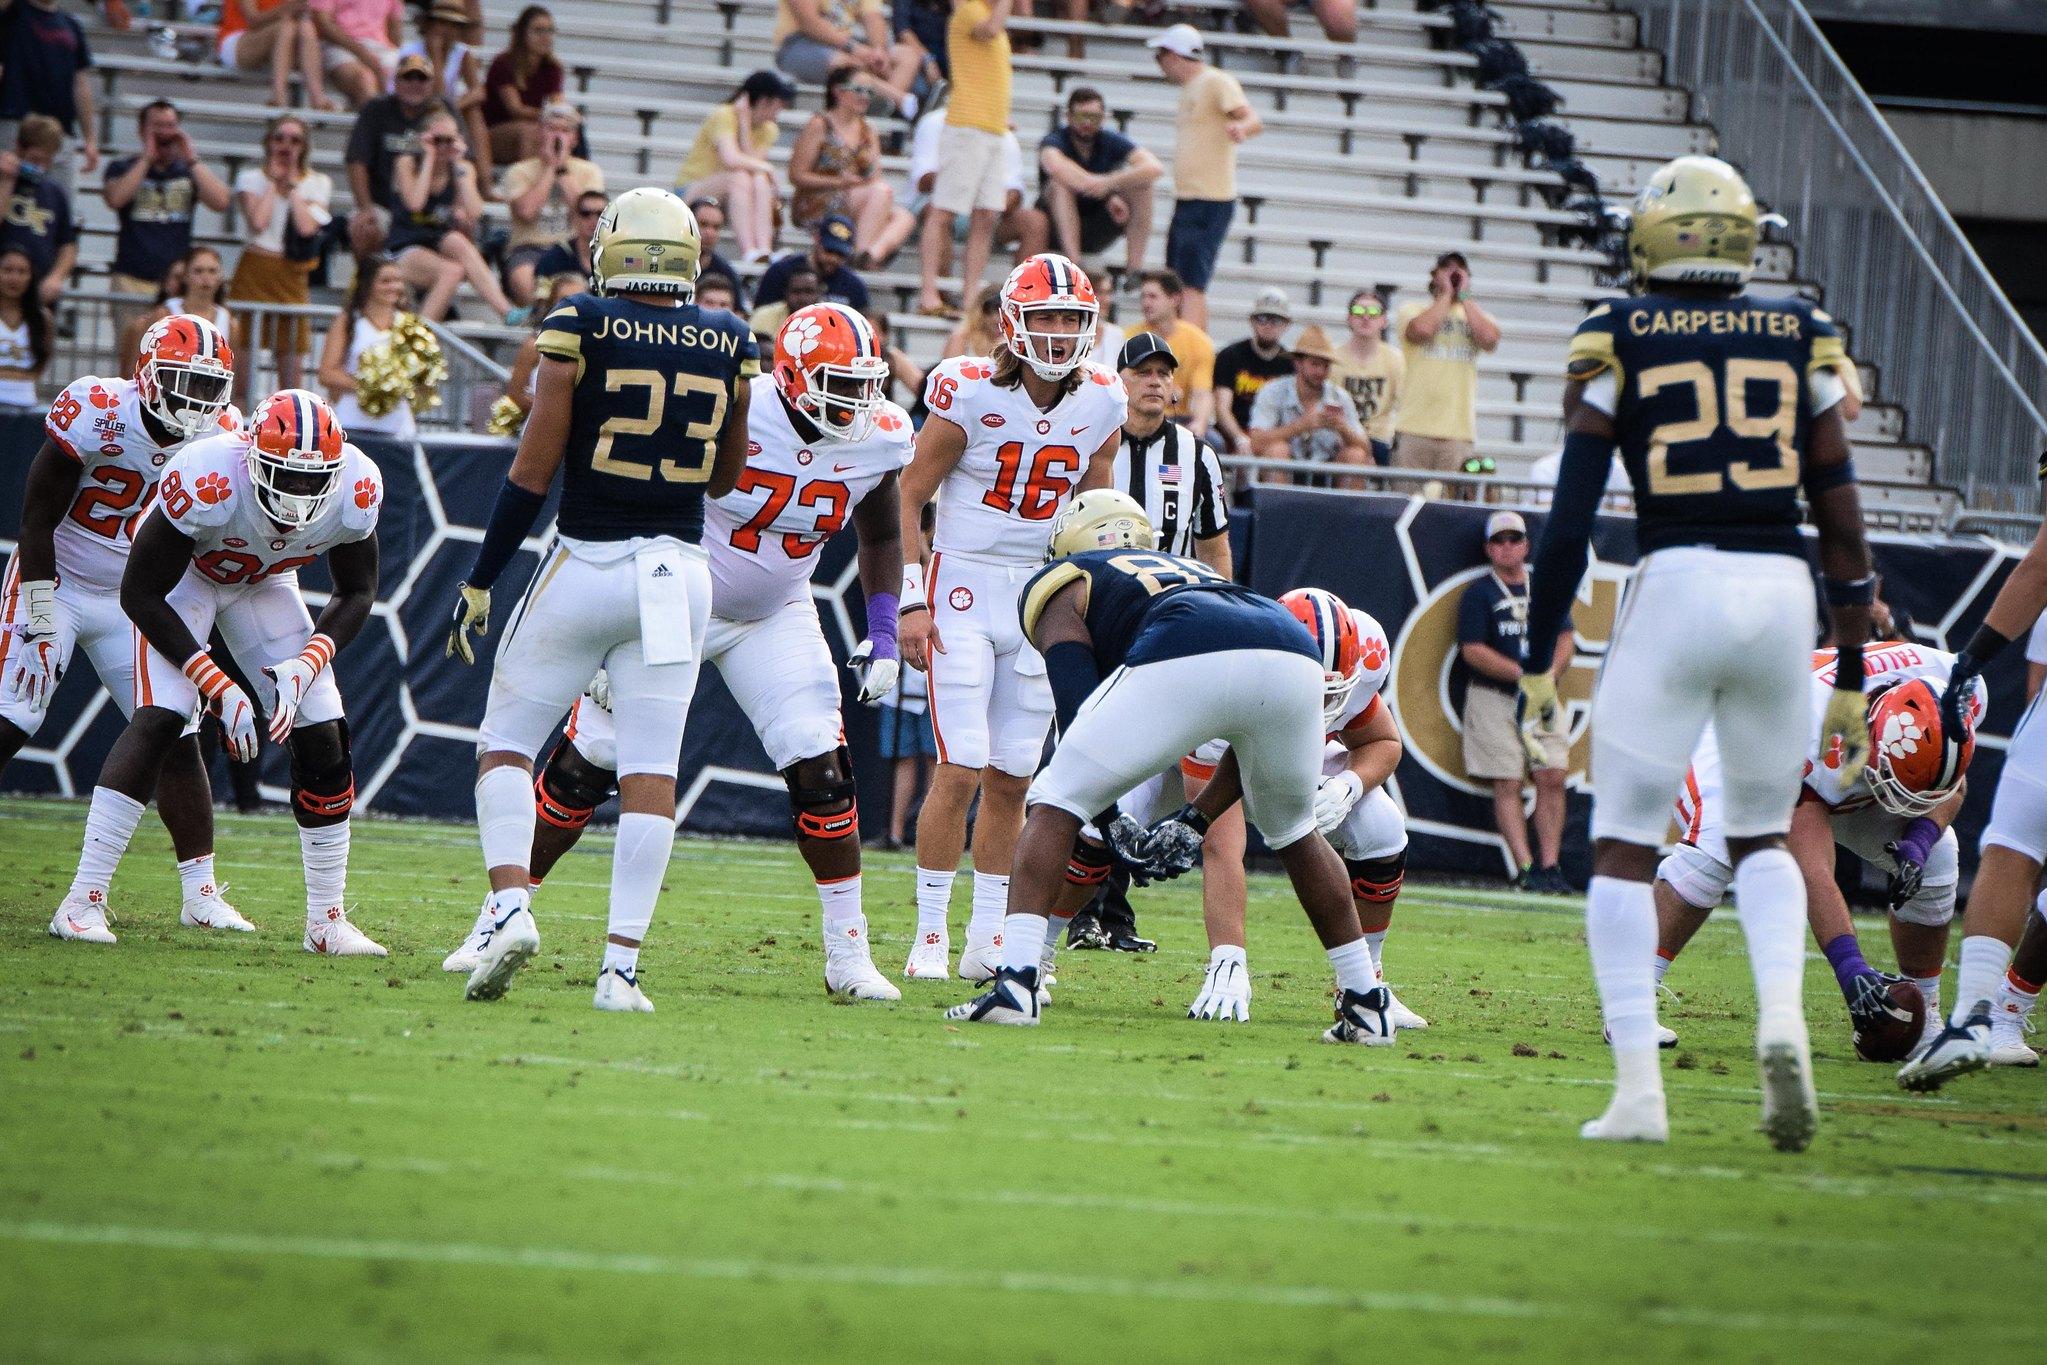 College Football: Georgia Tech vs #1 Clemson Preview